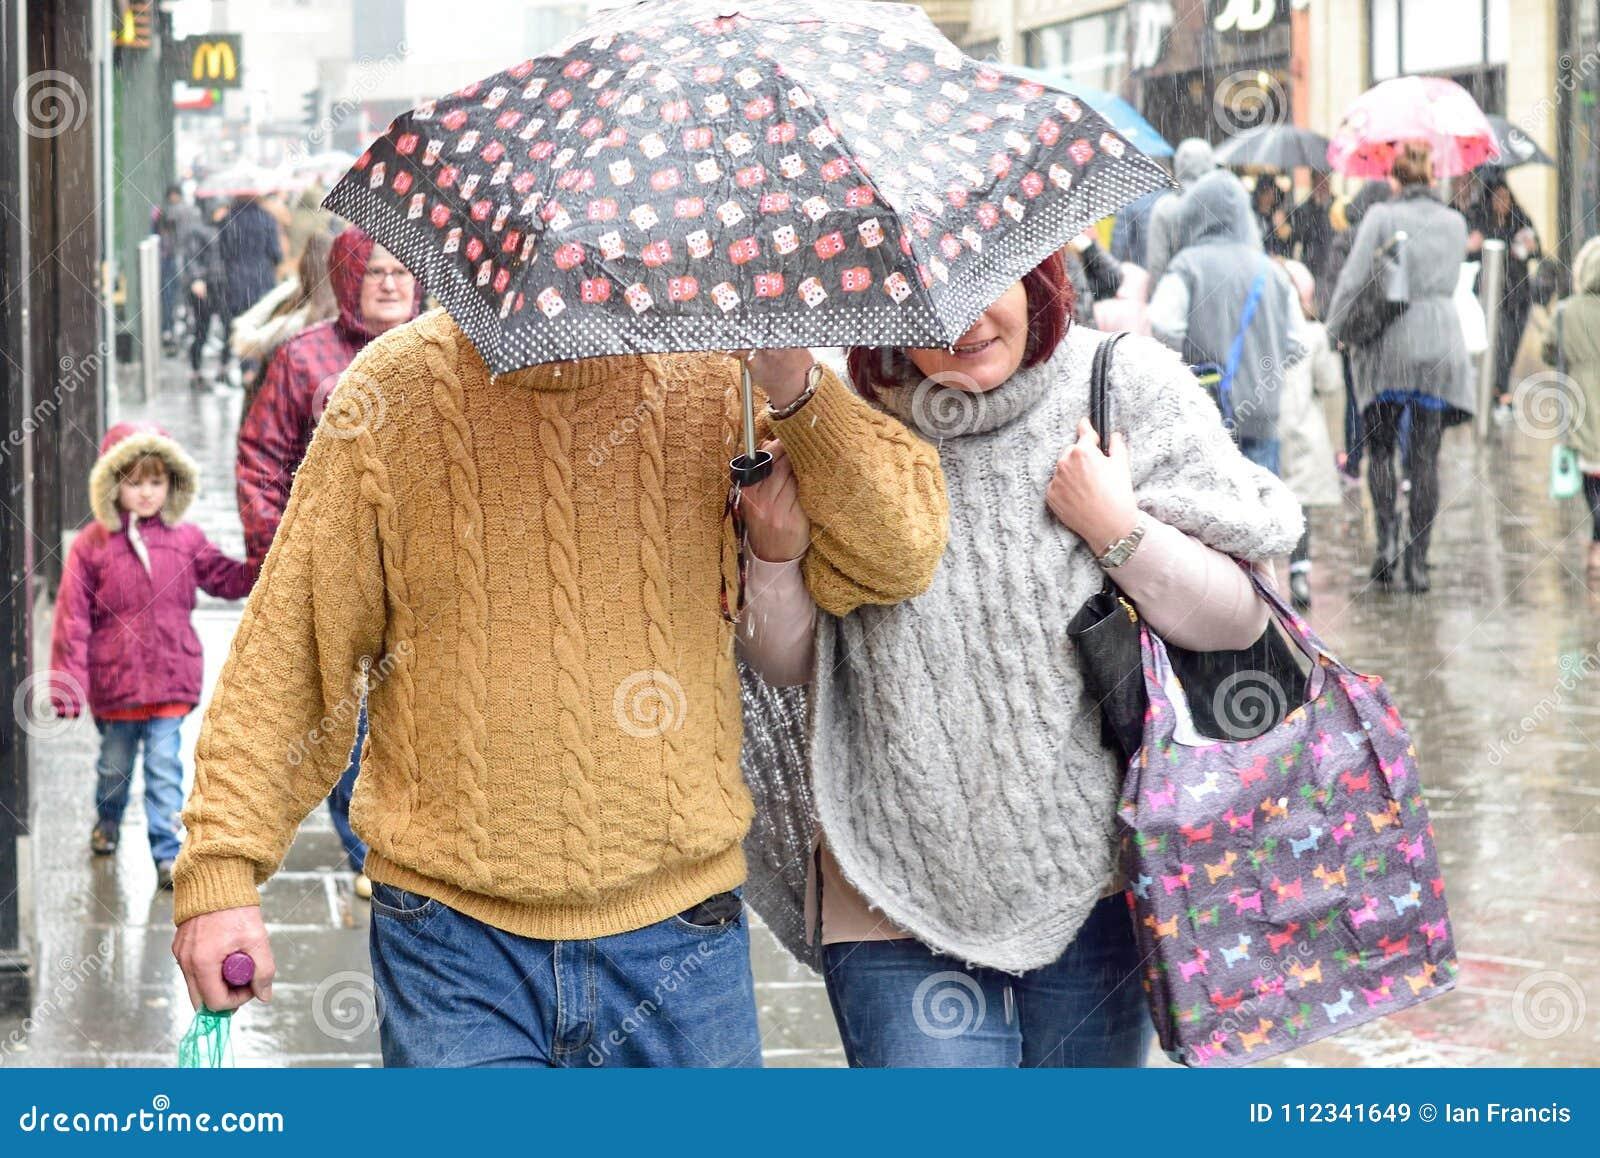 Couple shelter under umbrella In Heavy Rain in the ,UK.